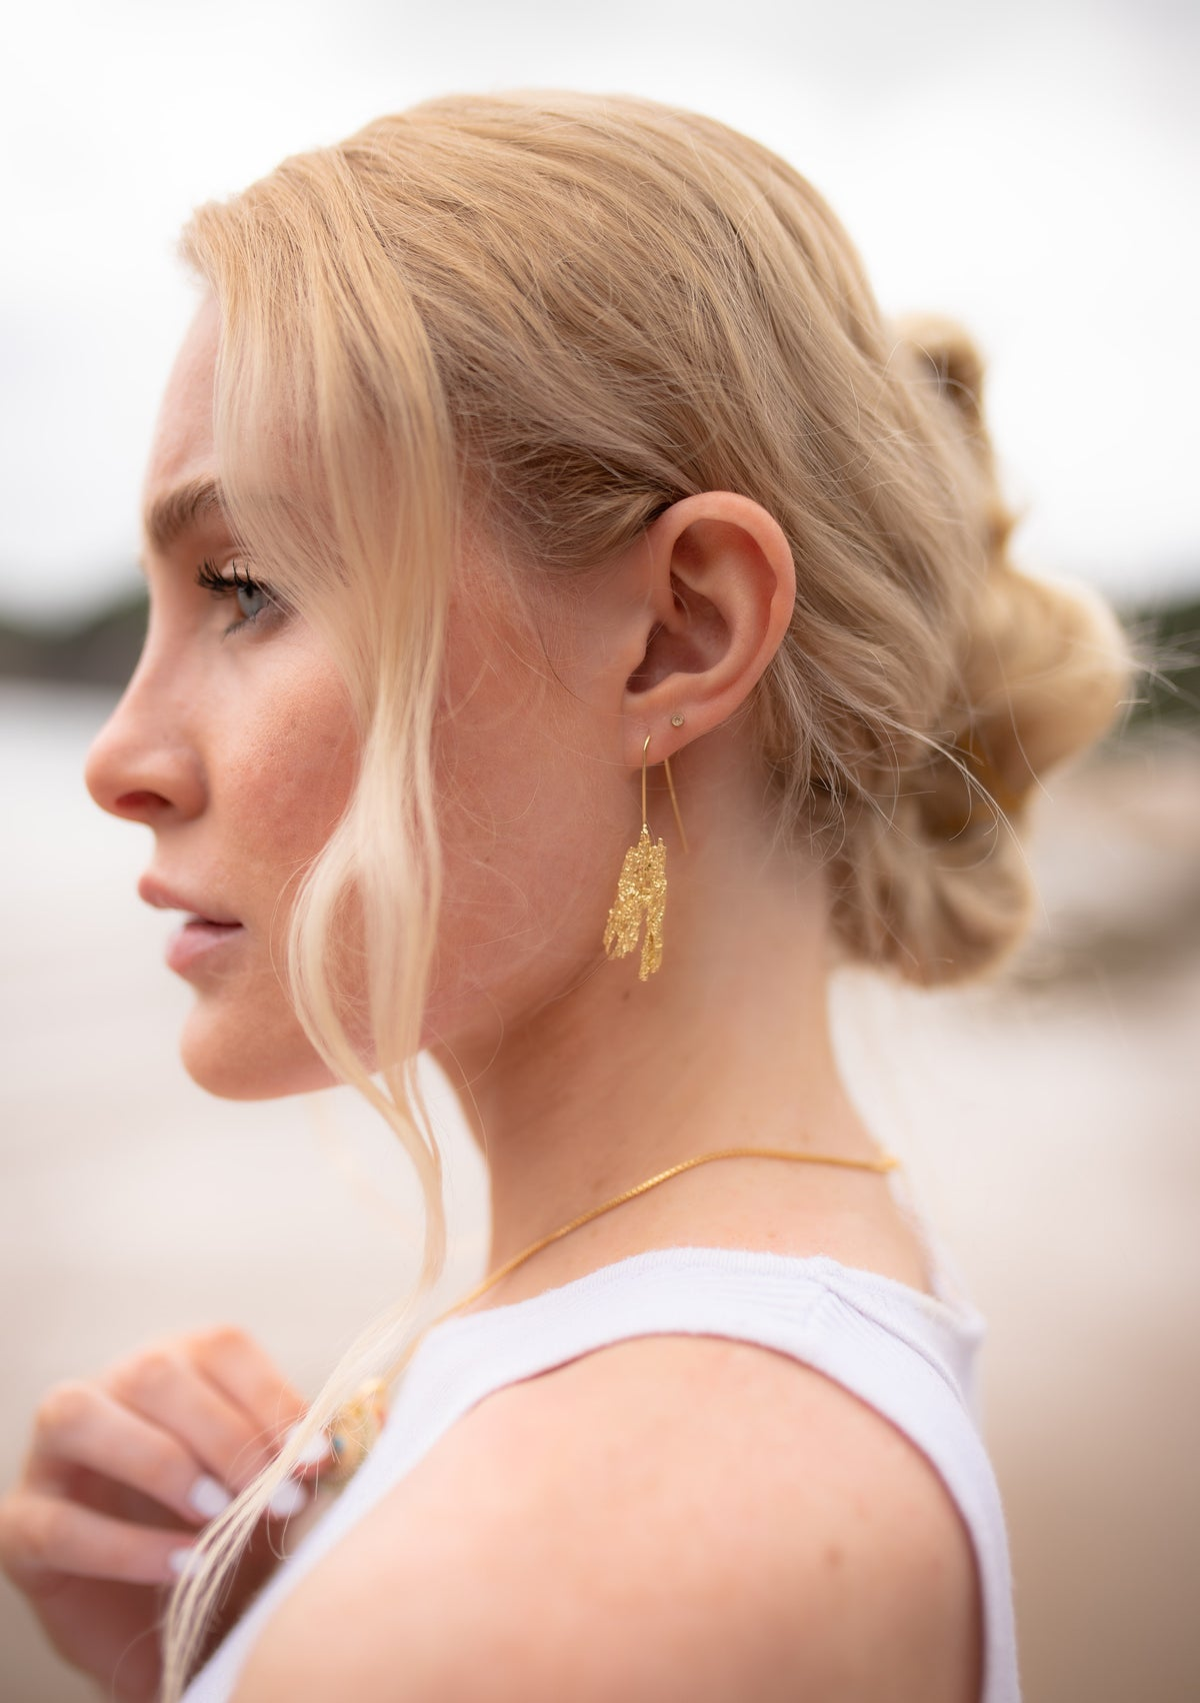 Sun Beam Earrings